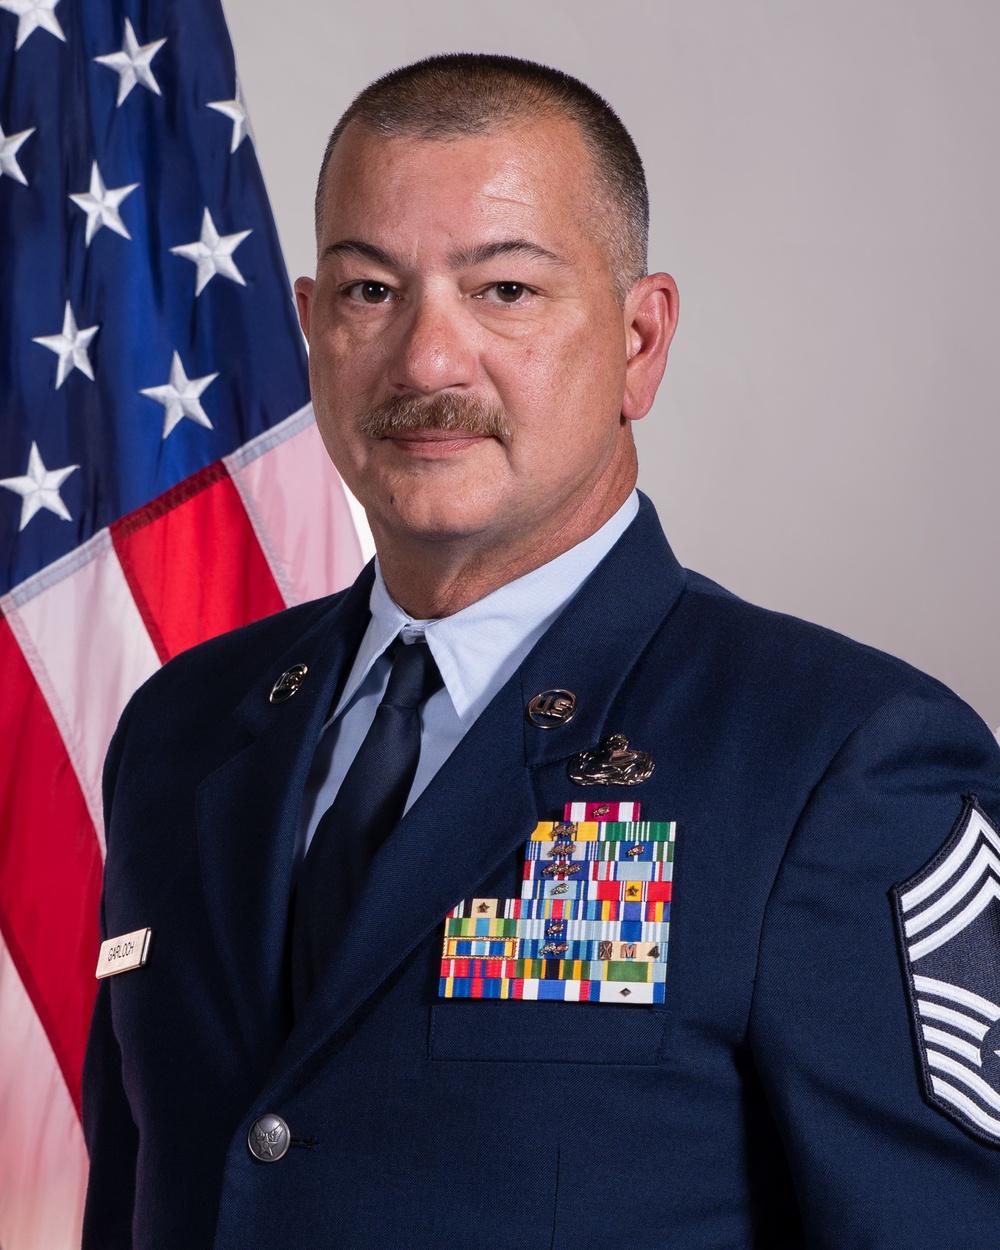 Chief Master Sgt. Garloch Official Photo